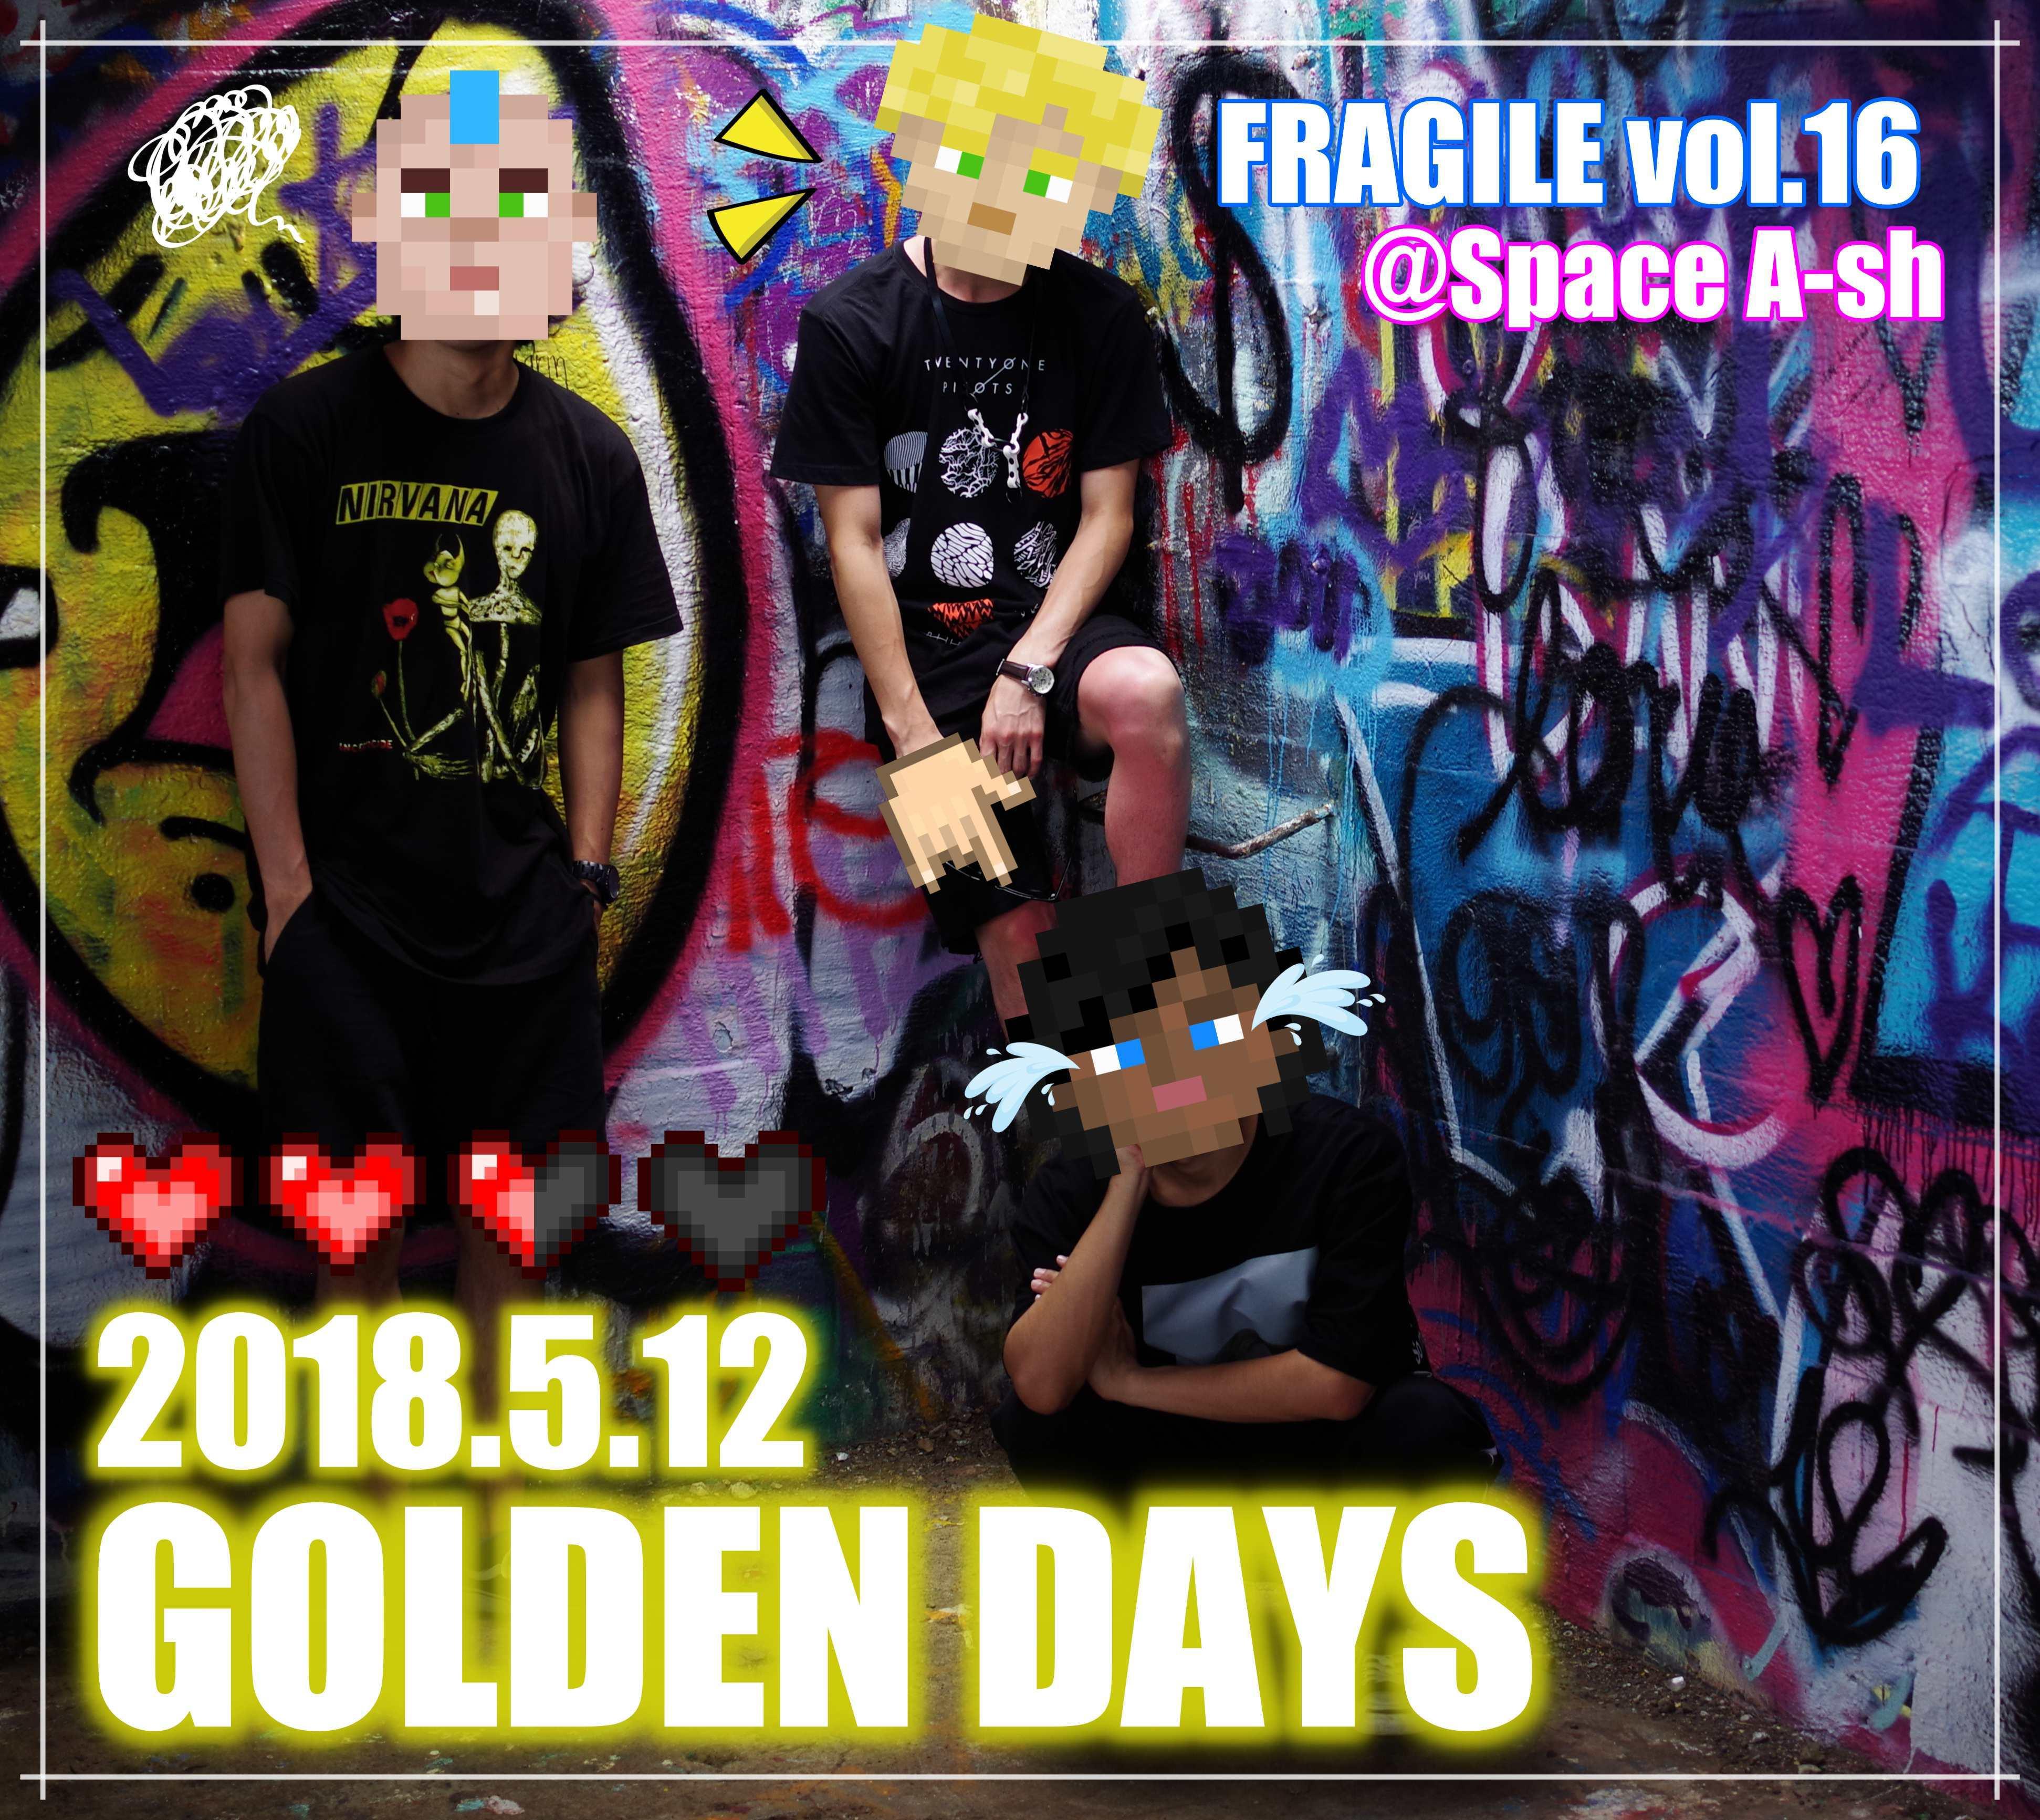 FRAGILE vol.16 GOLDEN DAYS